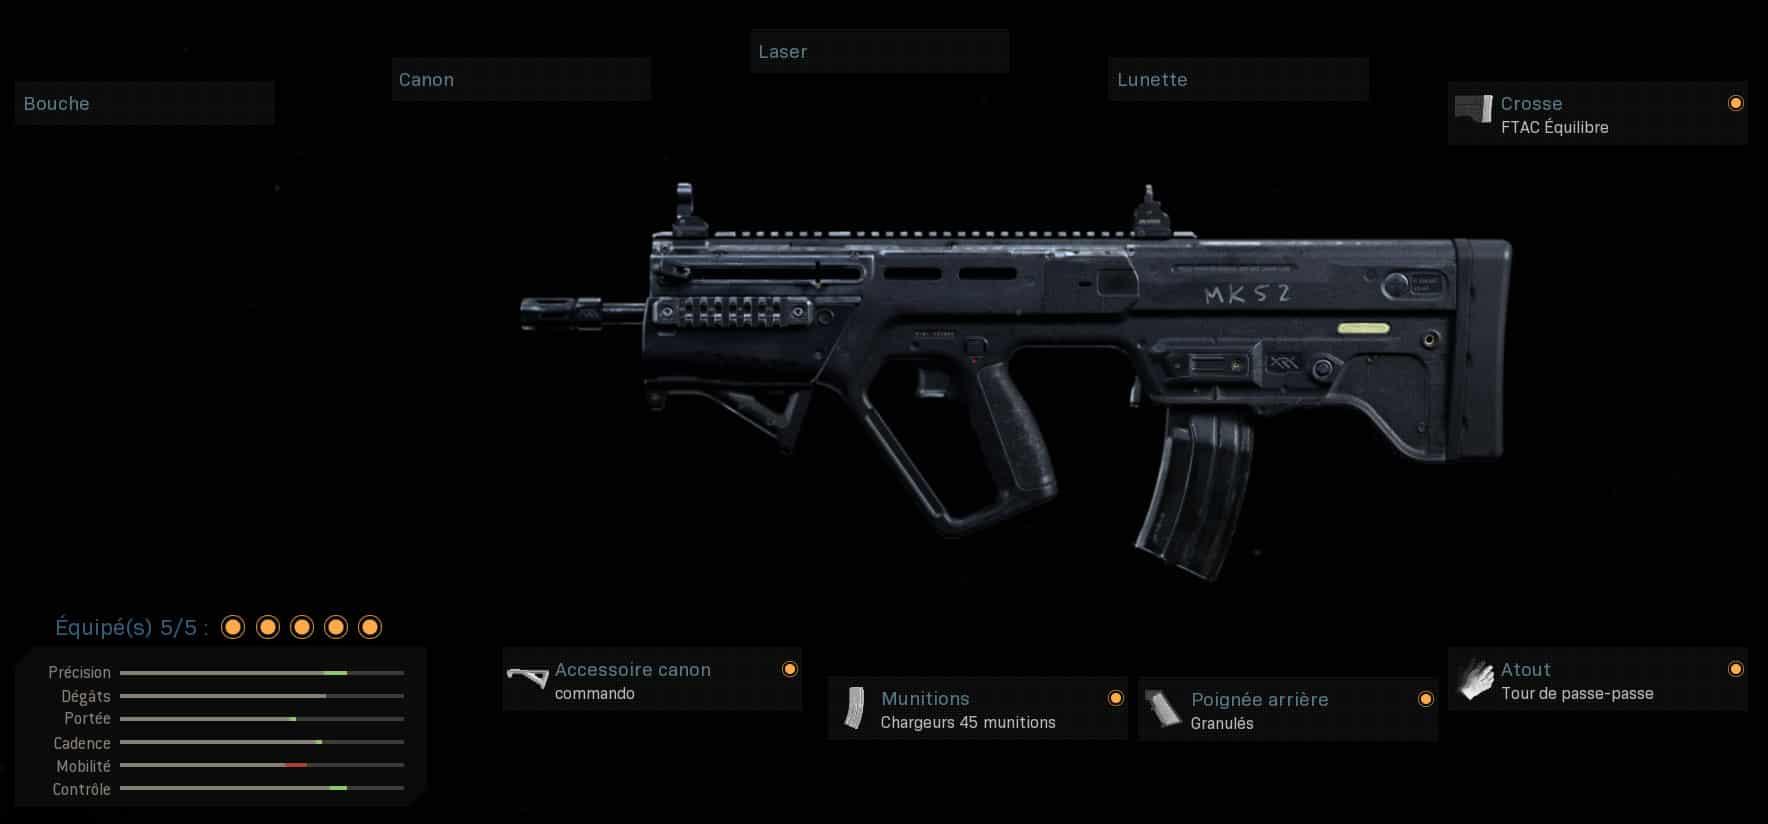 cod-call-of-duty-modern-warfare-RAM-7-meilleurs-loadout-attachments-mod-1